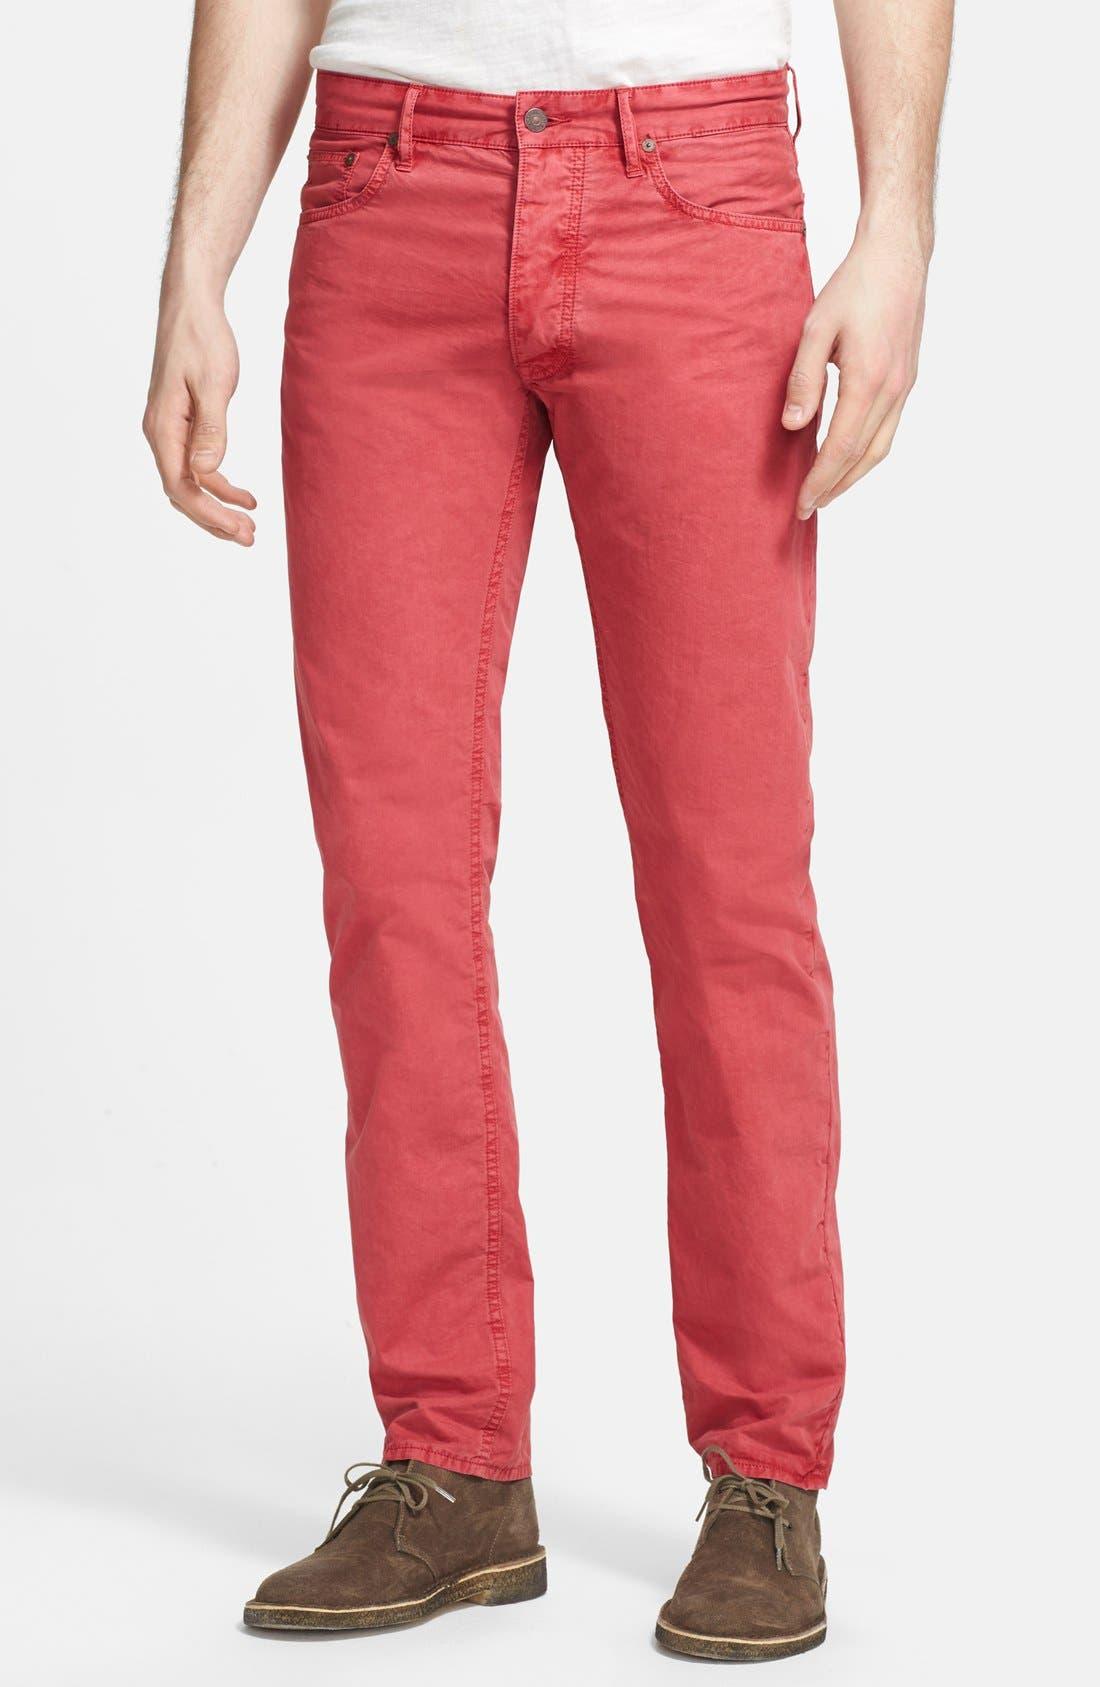 Alternate Image 1 Selected - Polo Ralph Lauren Slim Fit Poplin Pants (Nantucket Red)